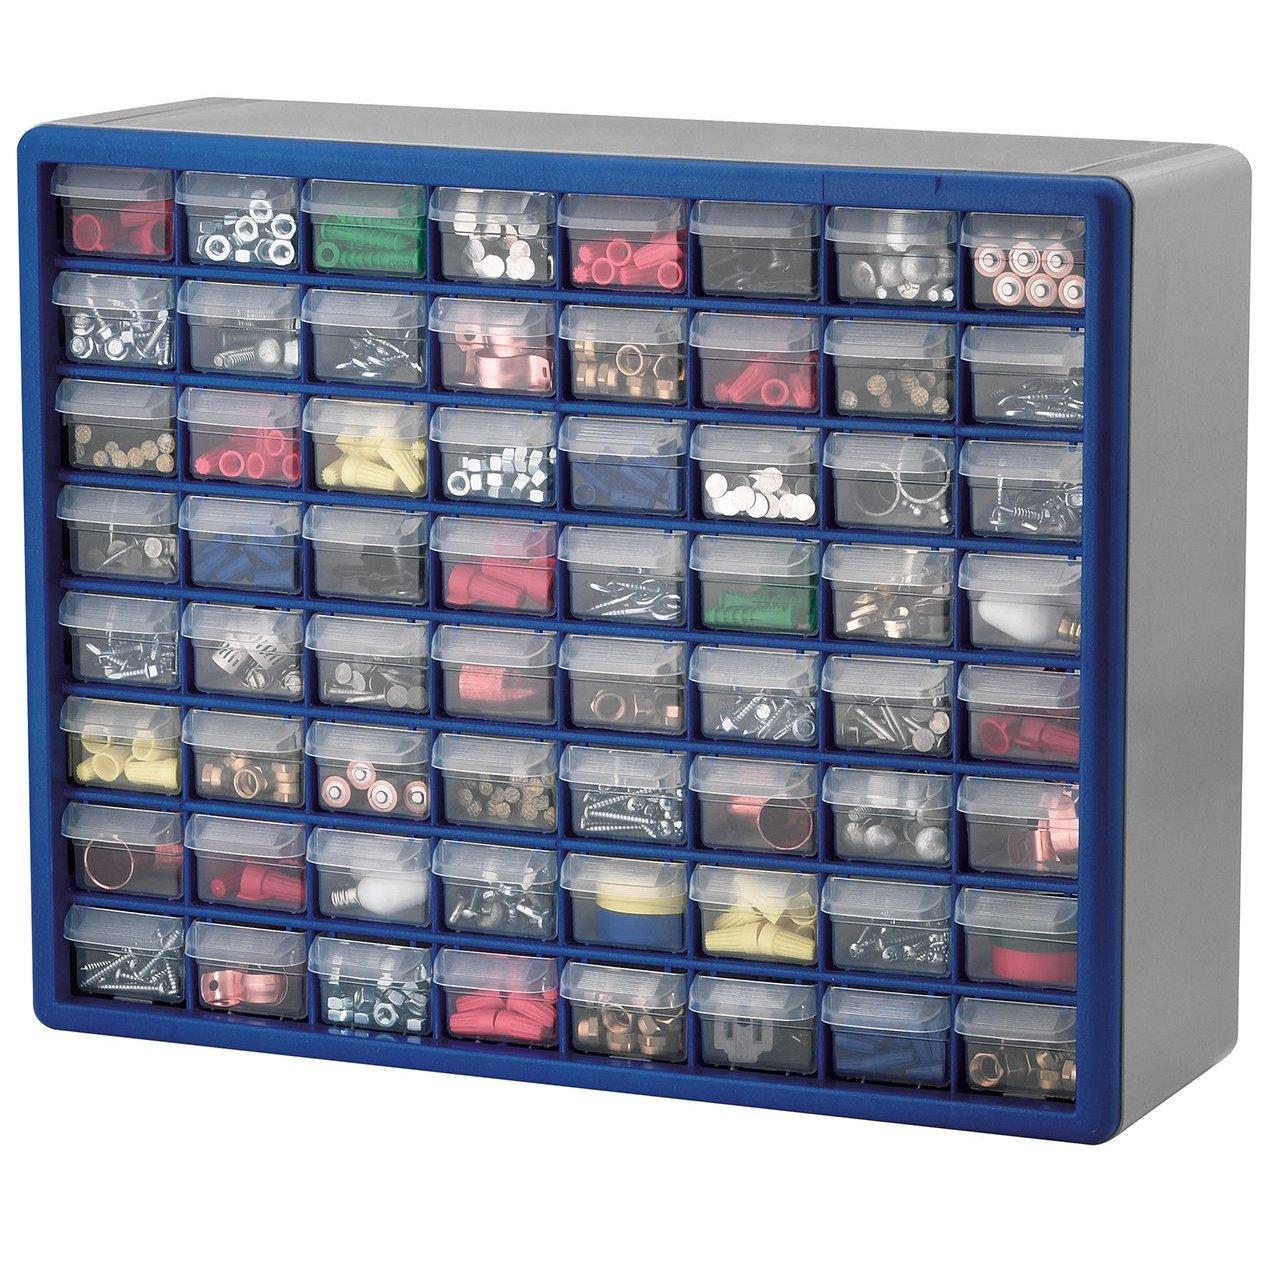 Craft storage drawers plastic -  Craft Storage Drawers Akro Mils 10764 64 Drawer Plastic Download